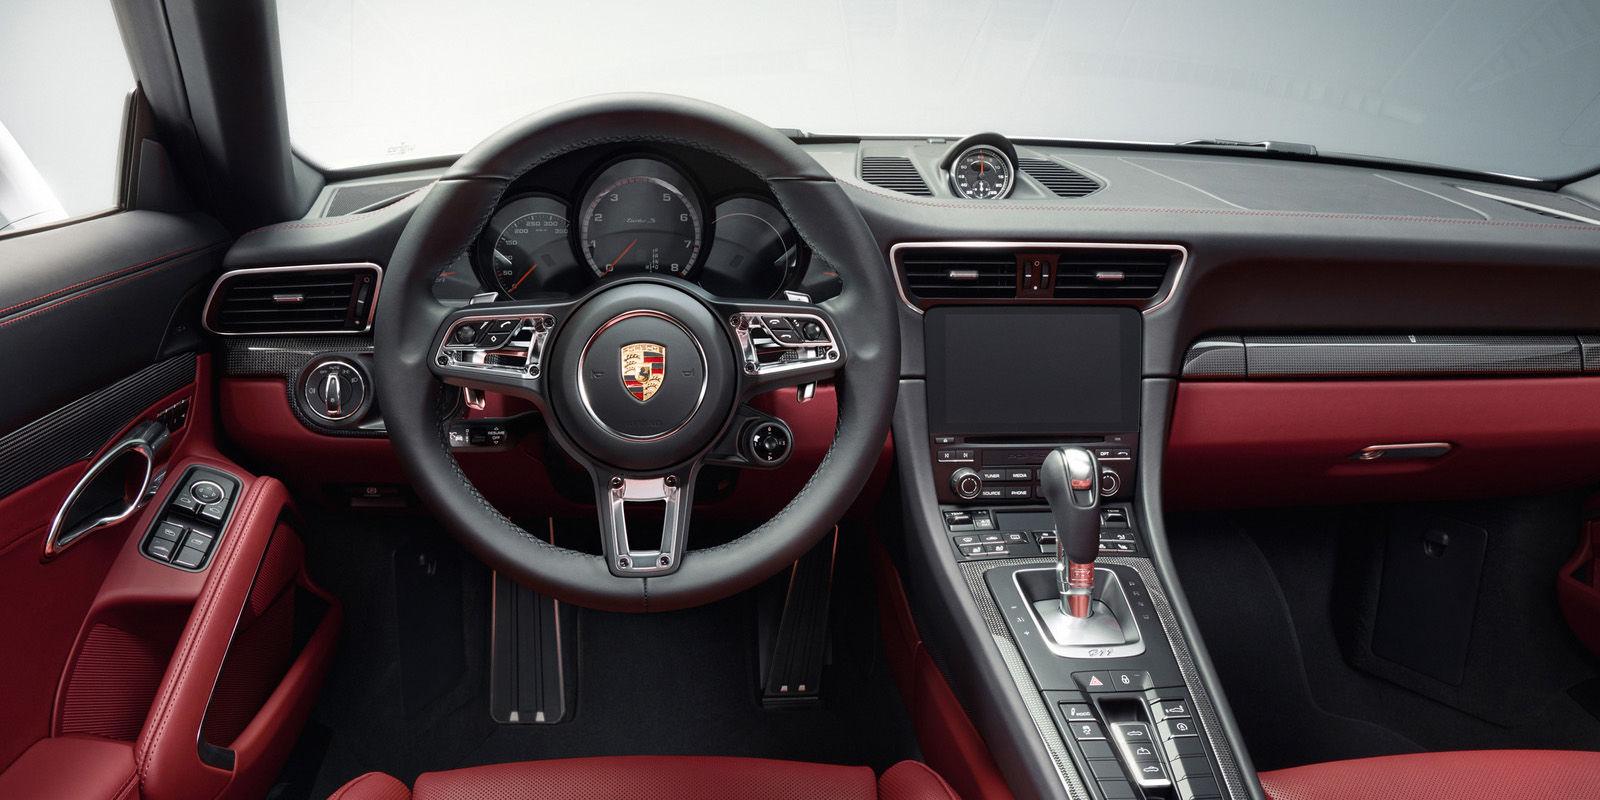 2017 Porsche 911 Turbo S Review Specs And Price >> Carshighlight Cars Review Concept Specs Price Porsche 911